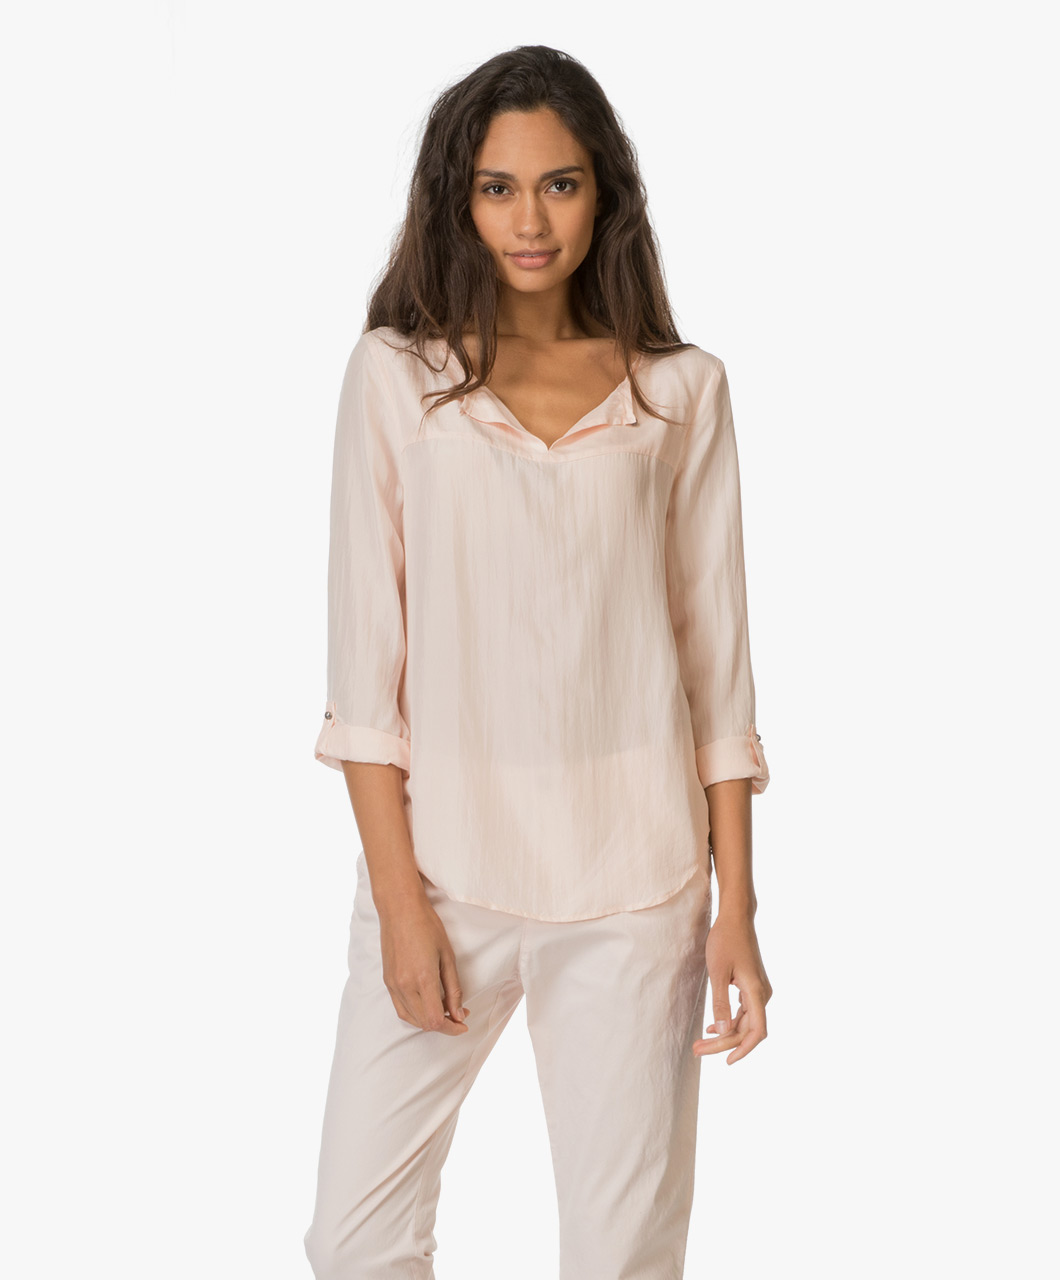 boss orange cesima silk blouse light pastel pink cesima 50330166 687 light pastel pink. Black Bedroom Furniture Sets. Home Design Ideas